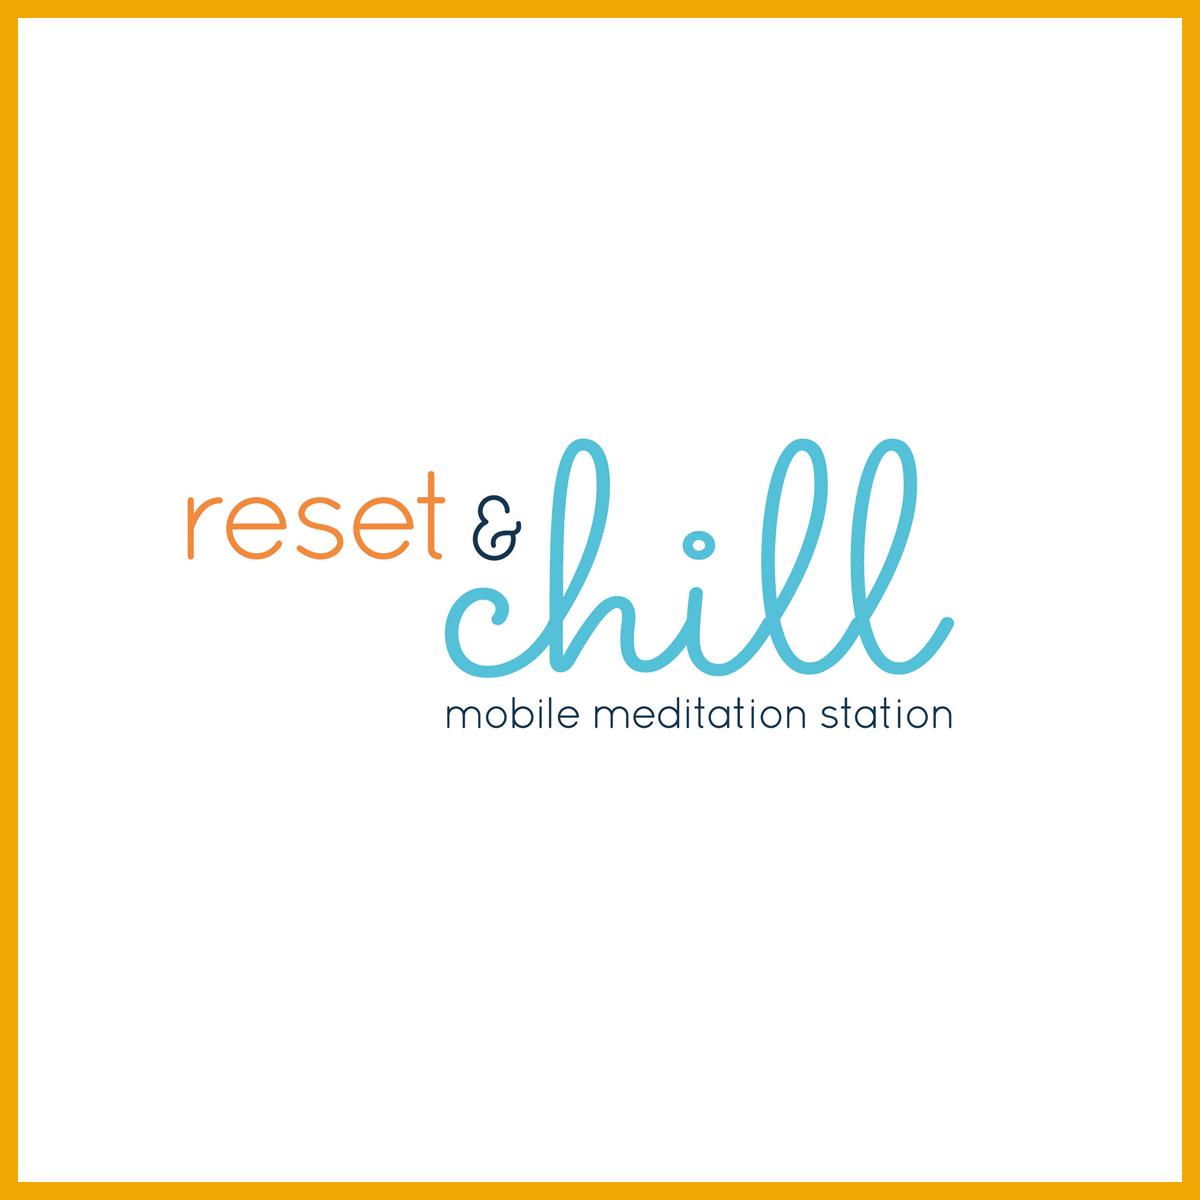 Creative Marketing - Reset and chill logo